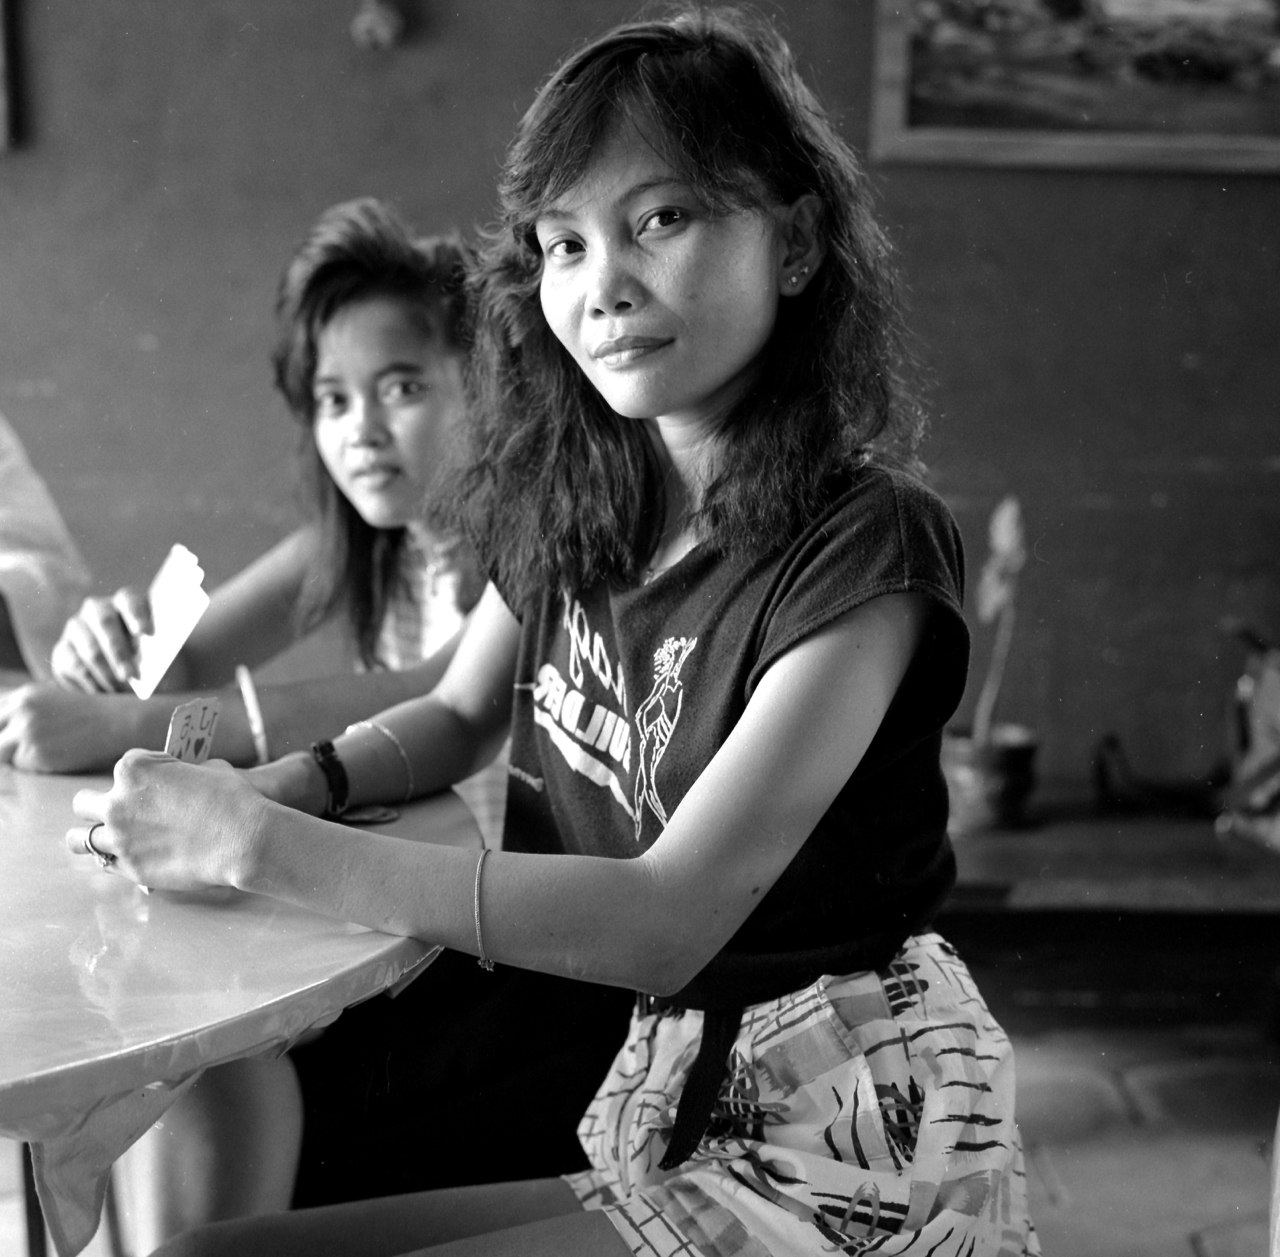 Playing Cards, Bario Boretto, Subic Bay 1991